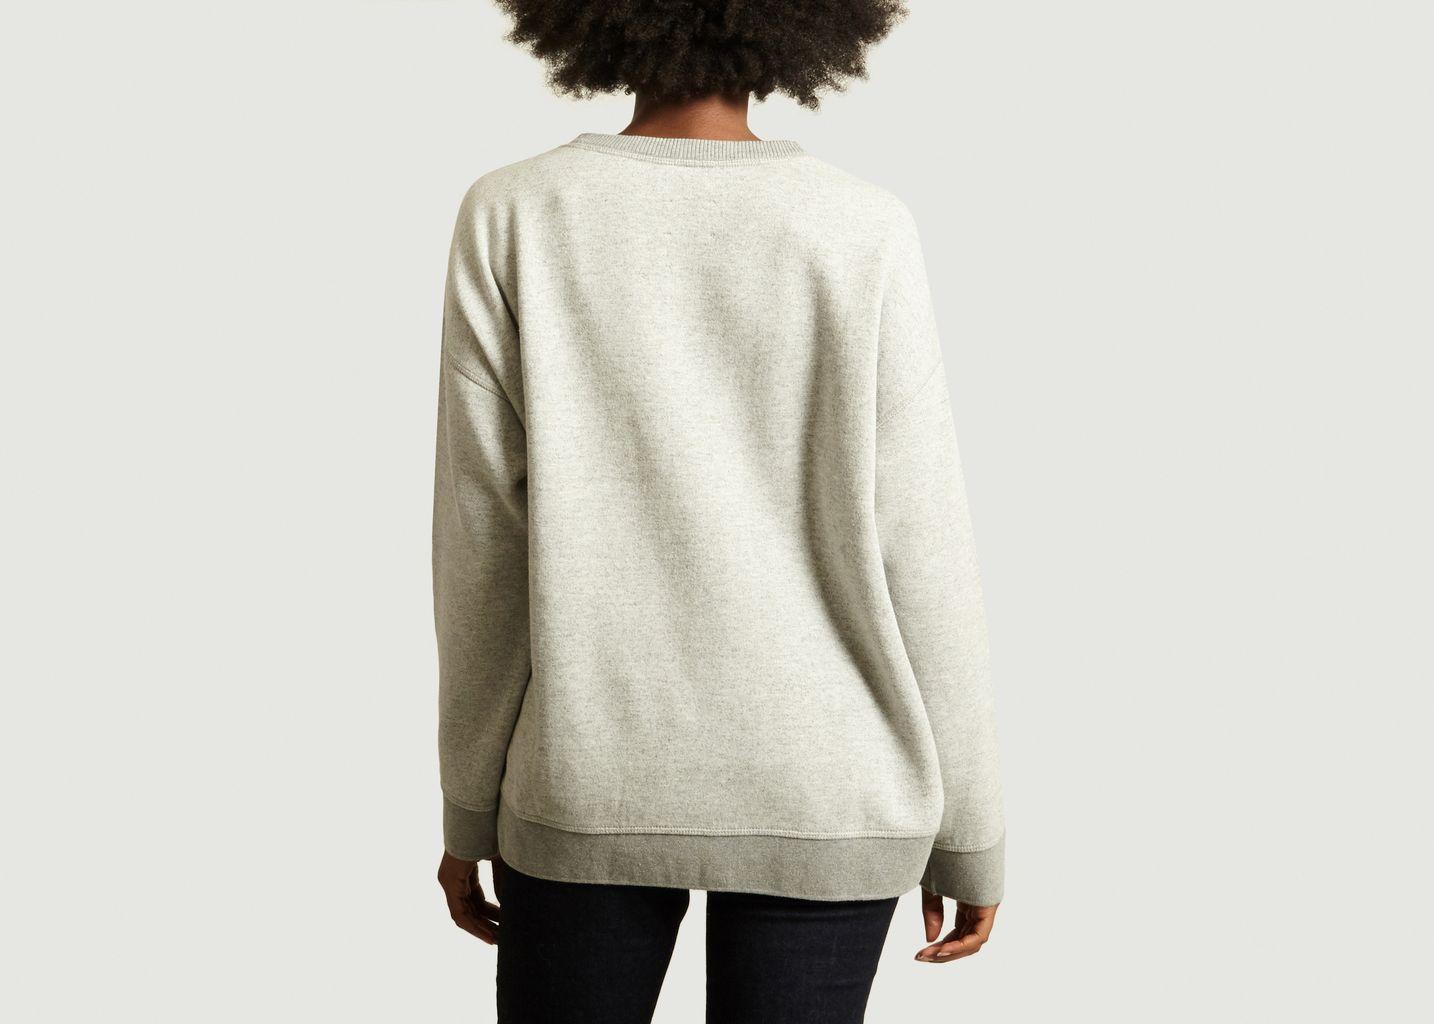 Sweatshirt Snoopy - Swildens